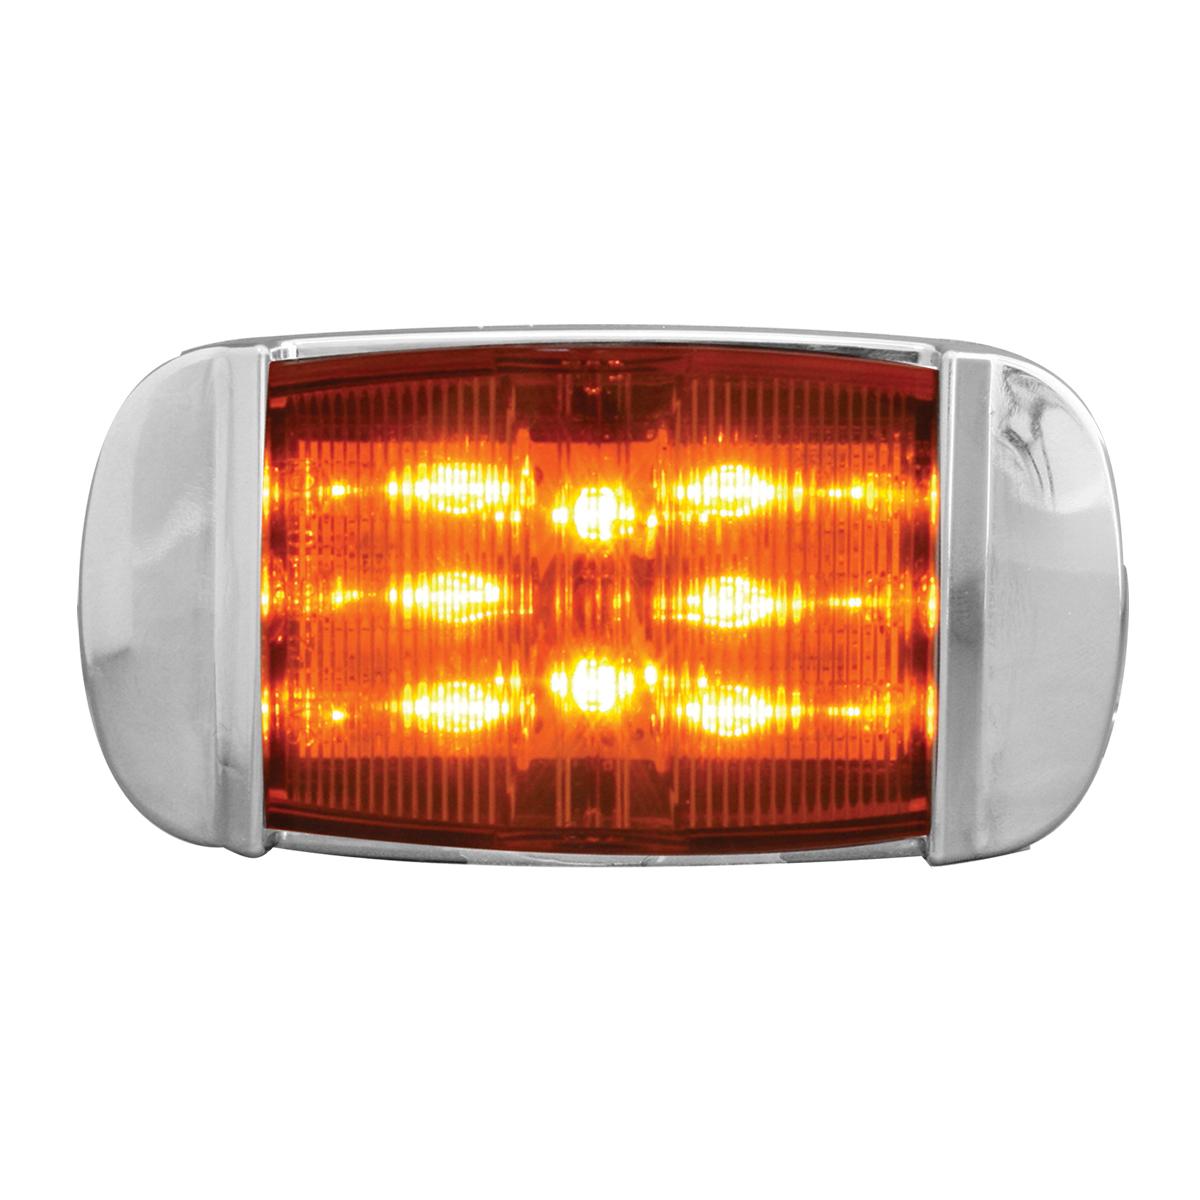 76254 Rectangular Camel Back Wide Angle LED Marker Light w/ Chrome Bezel